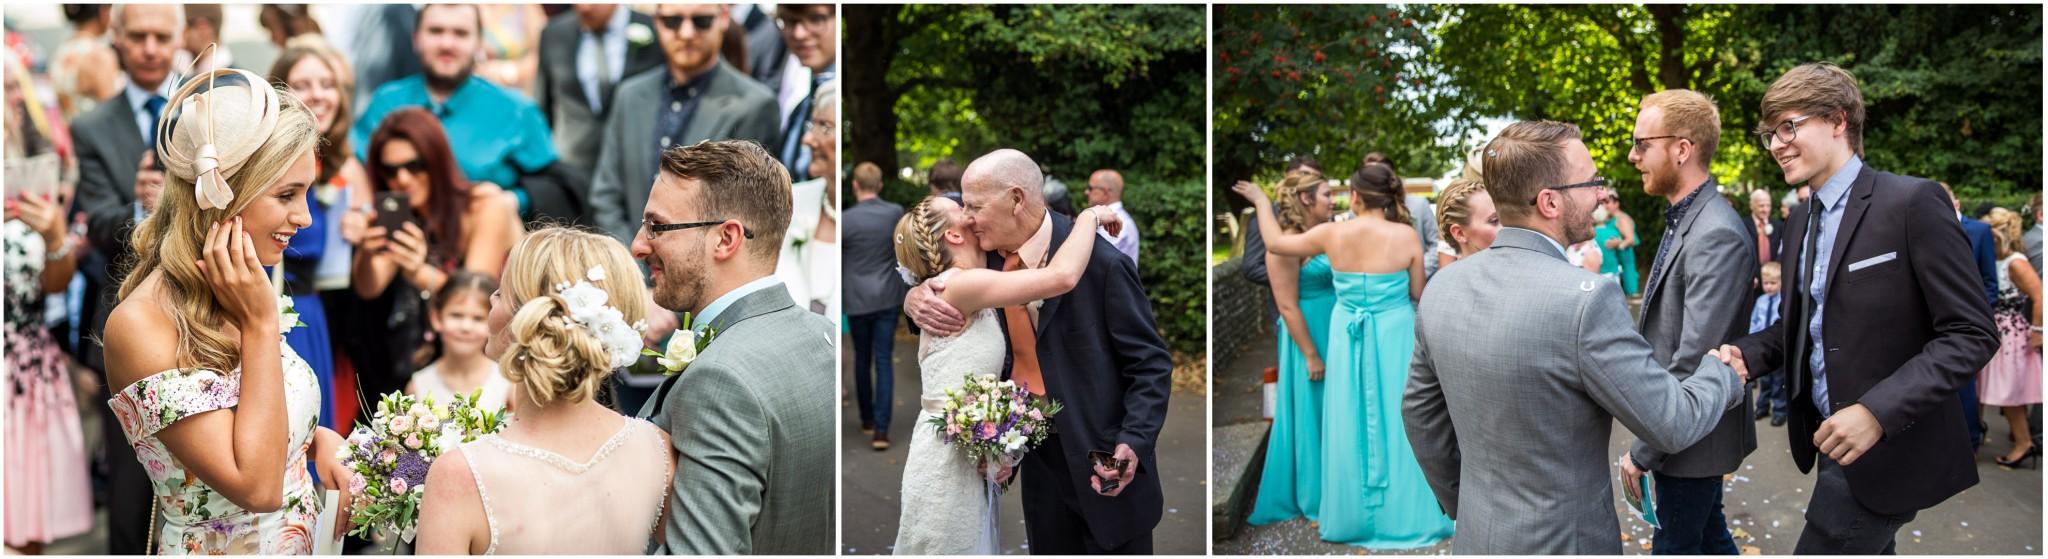 St Thomas a Becket Church Wedding Guests congratulate the Bride & Groom